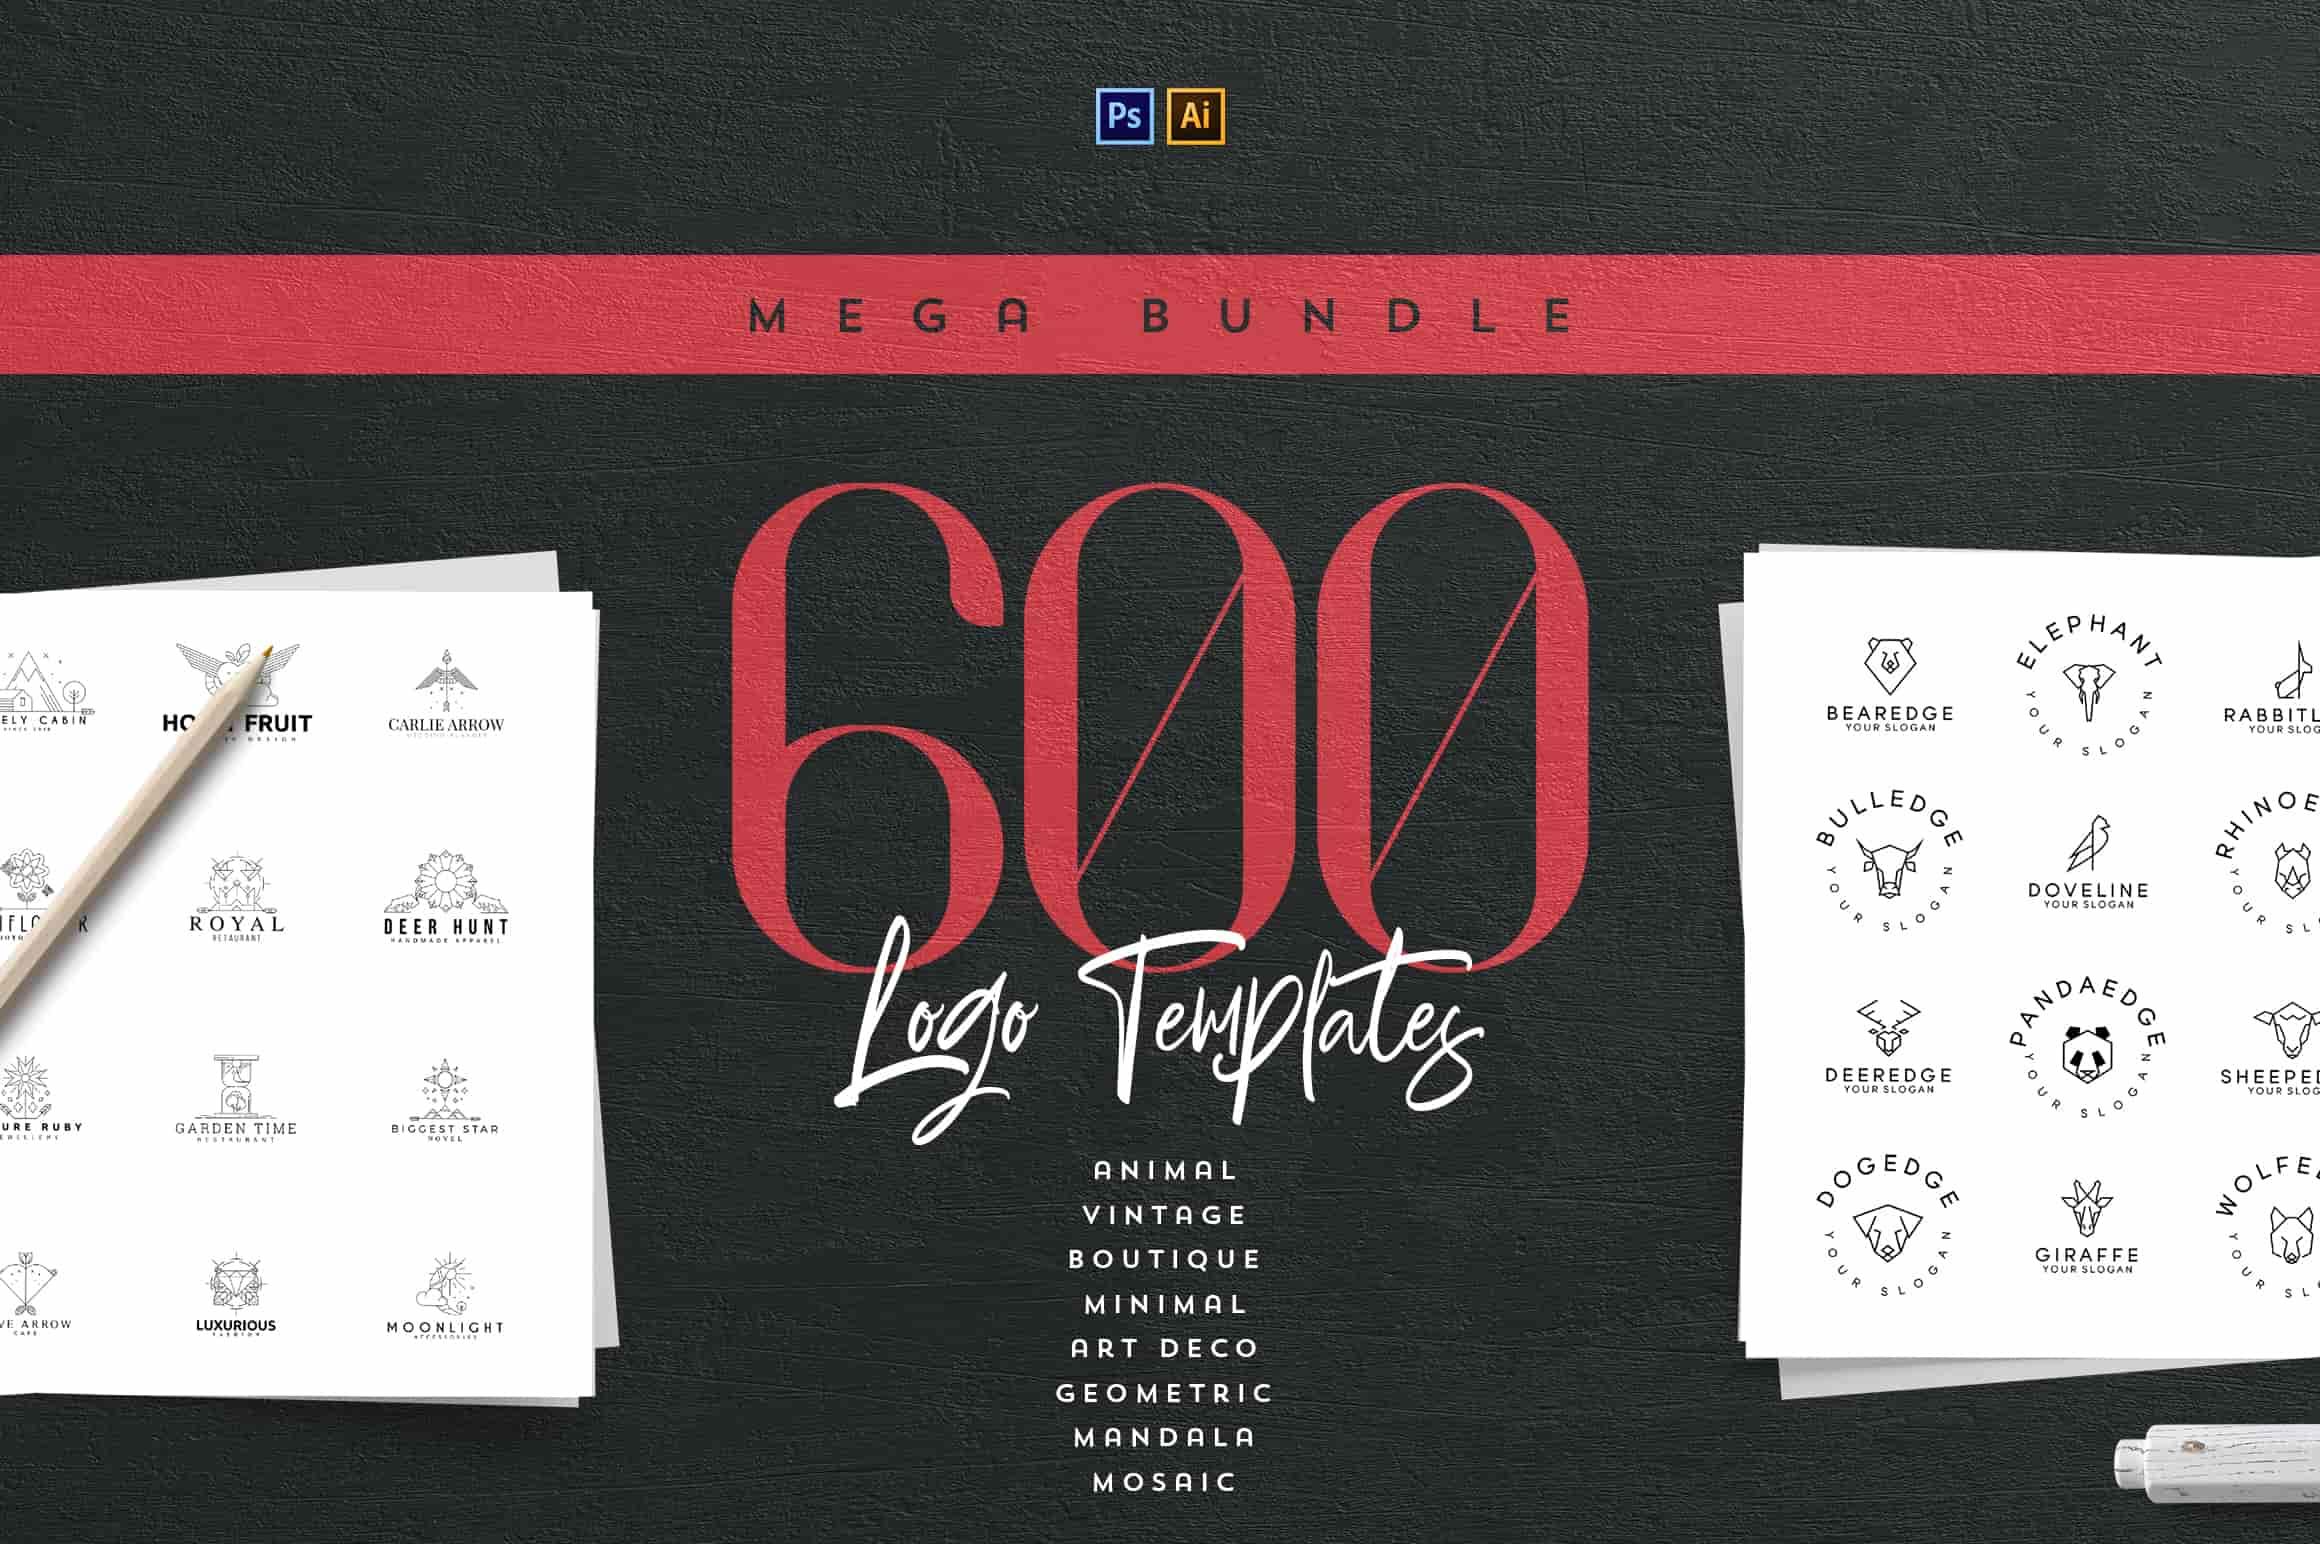 Mega Bundle - 600 Logo Templates - $29 - 1 1 min